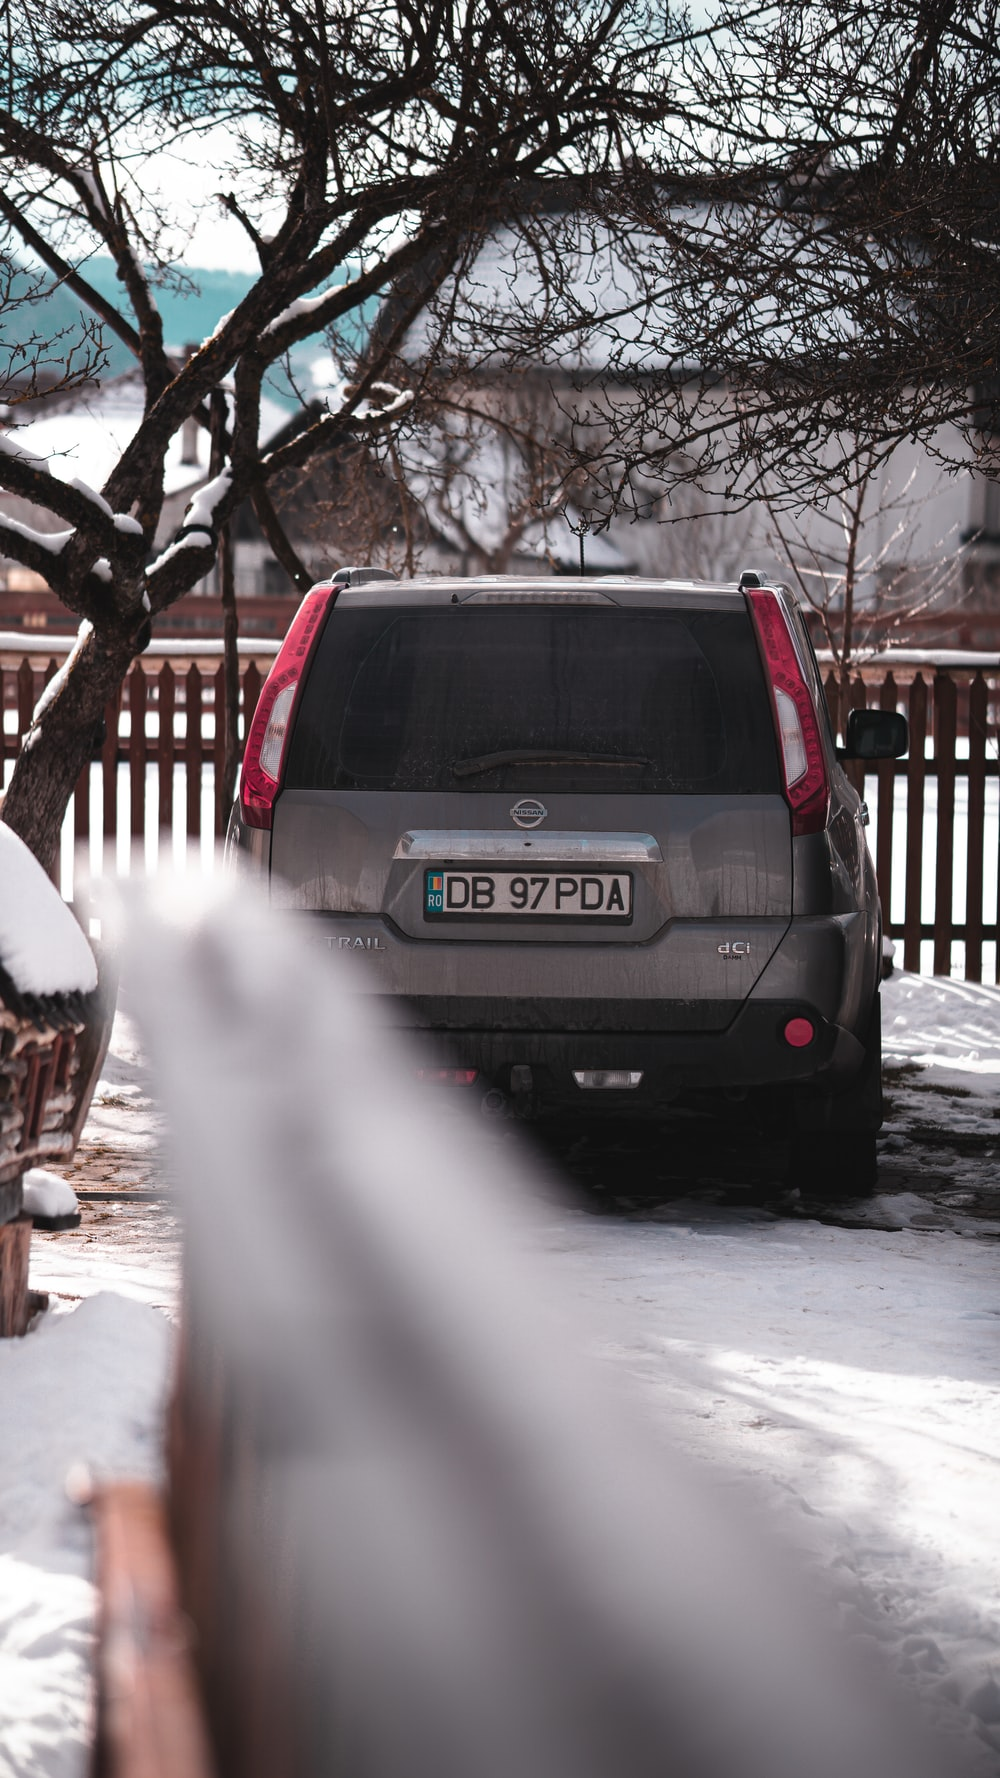 black honda car on snow covered road